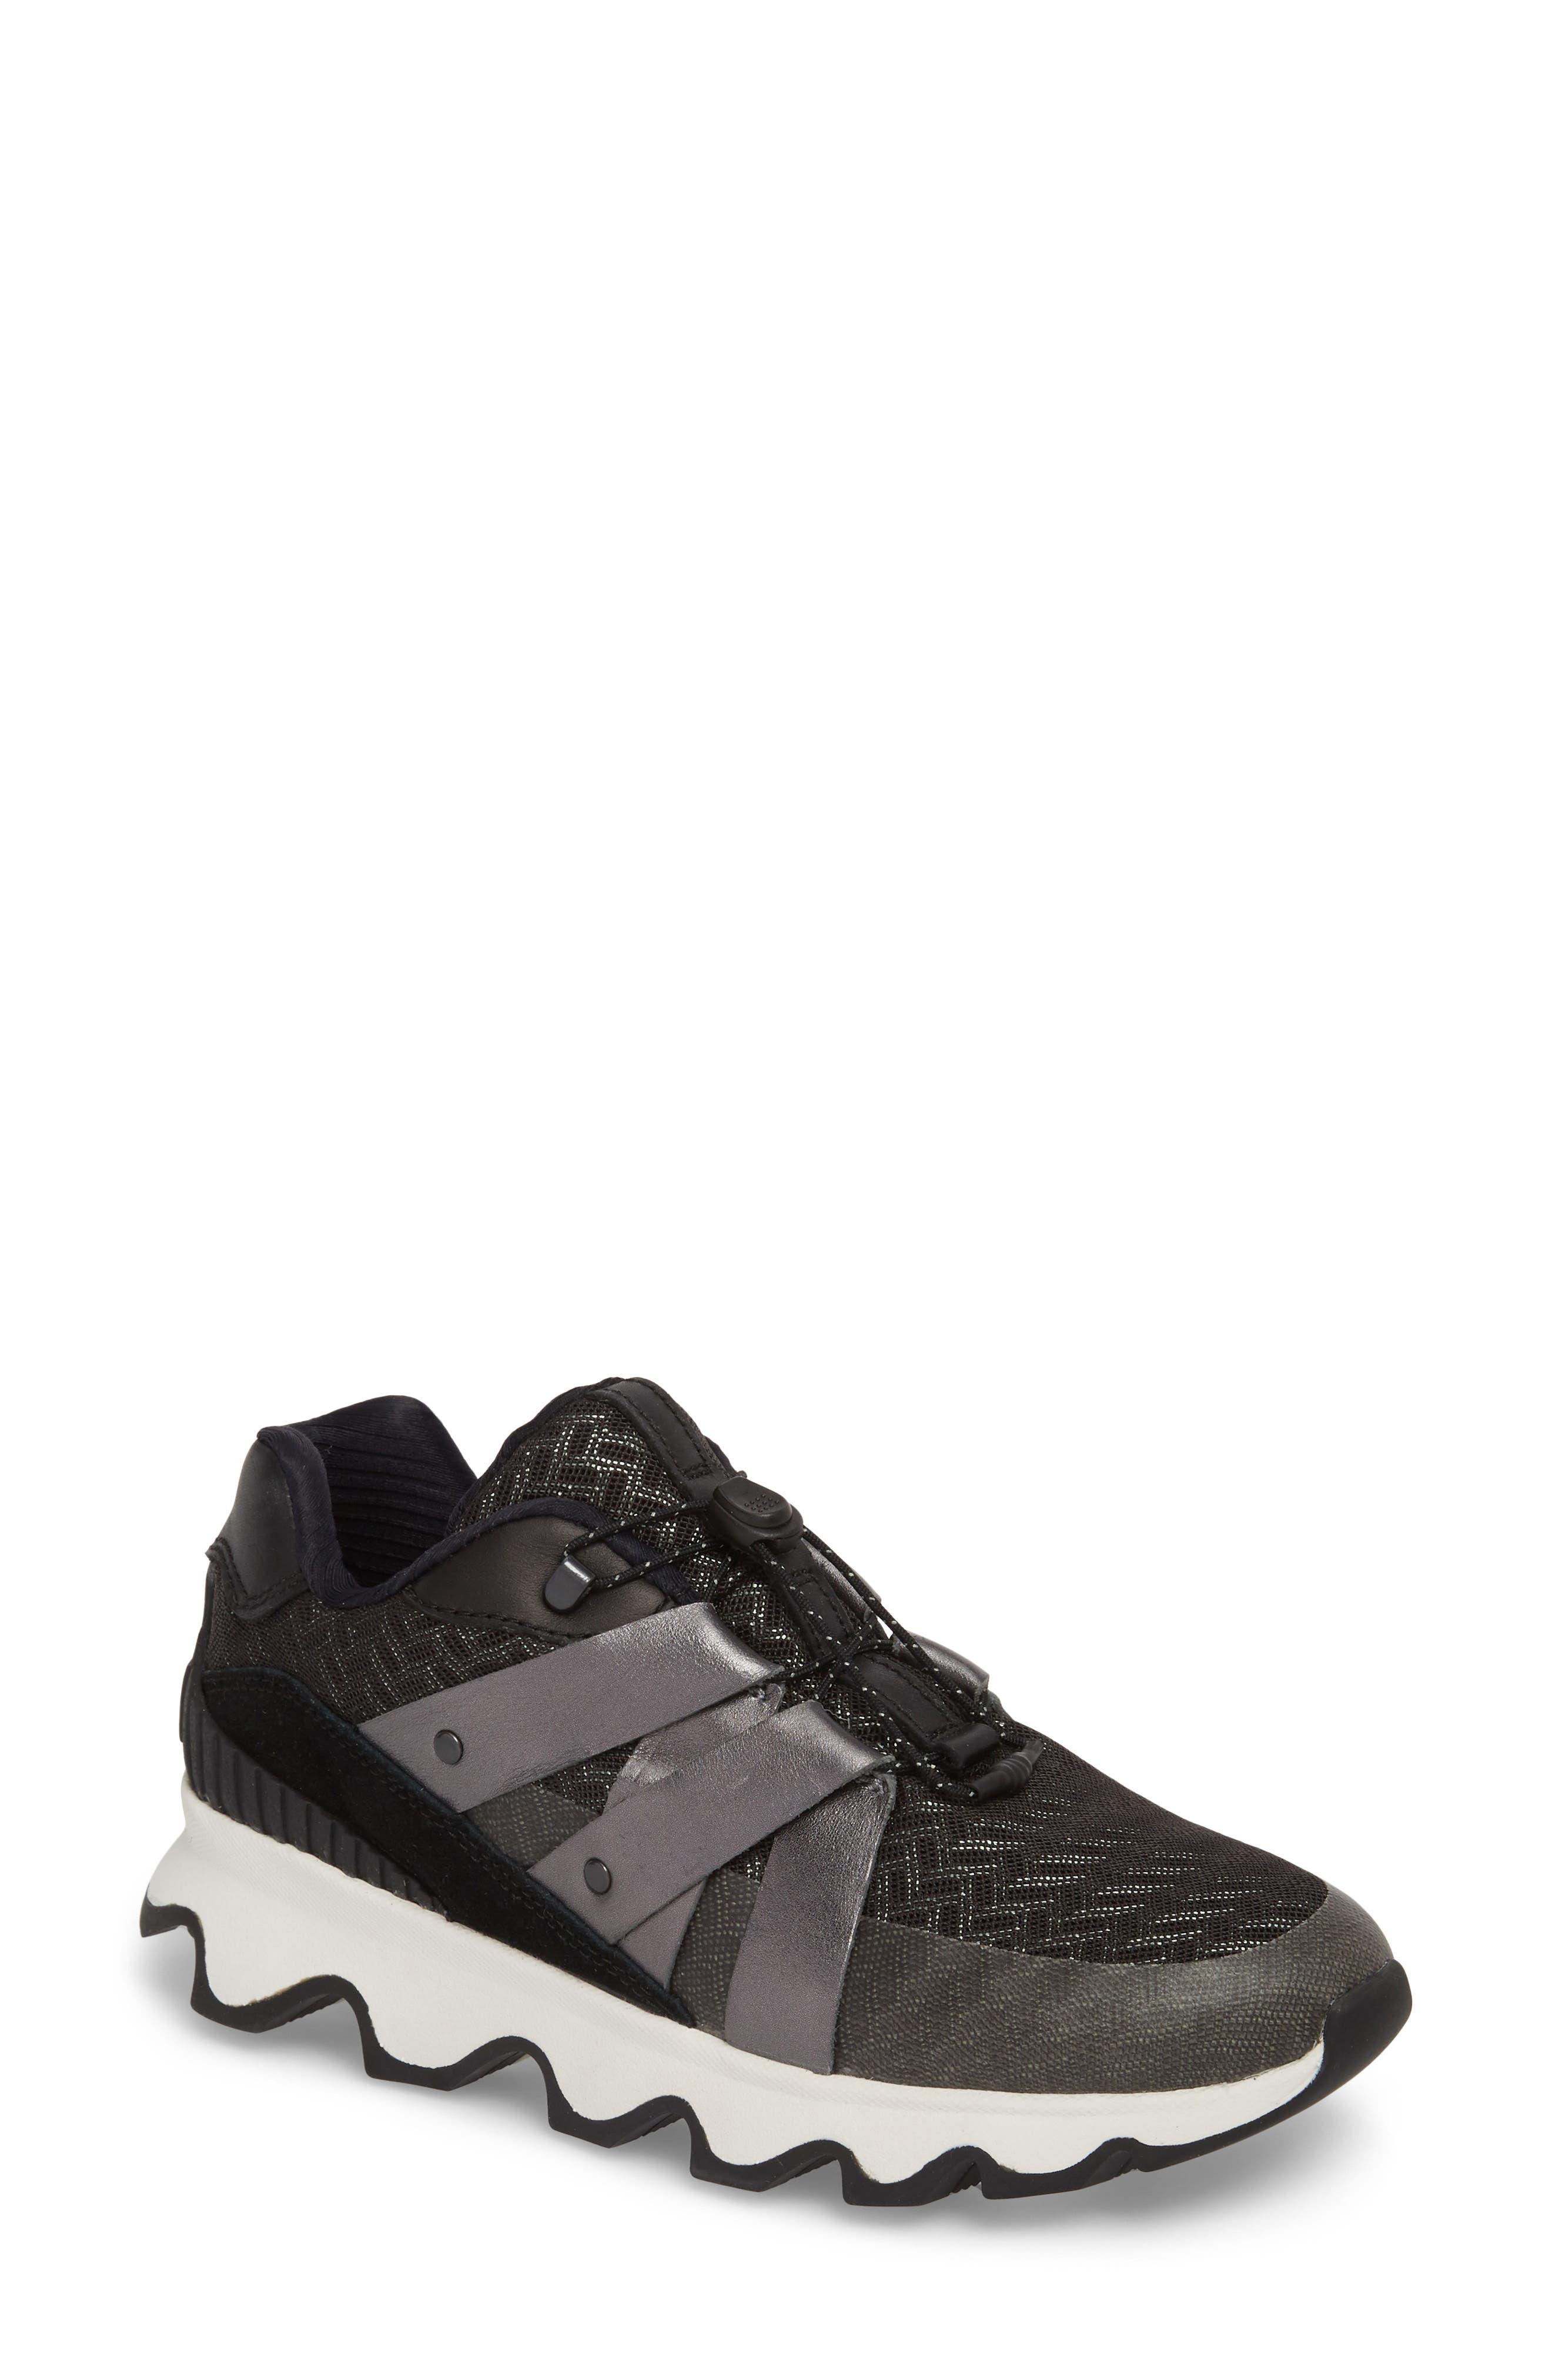 Kinetic Speed Sneaker,                             Main thumbnail 1, color,                             Black/ Sea Salt